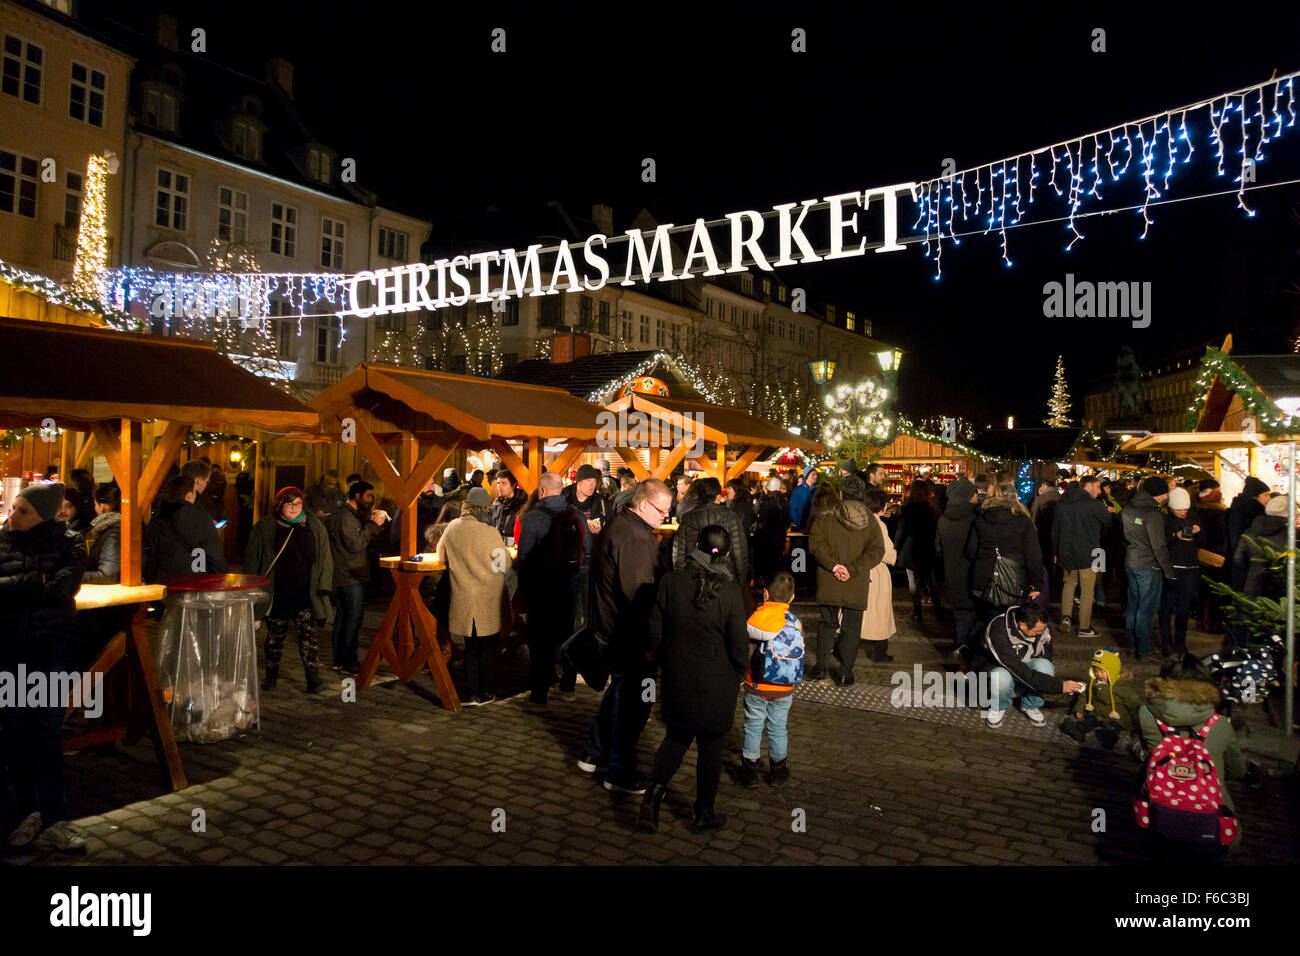 Christmas market in Højbro Plads (Hoejbro Square) on Strøget  a mid November evening. - Stock Image